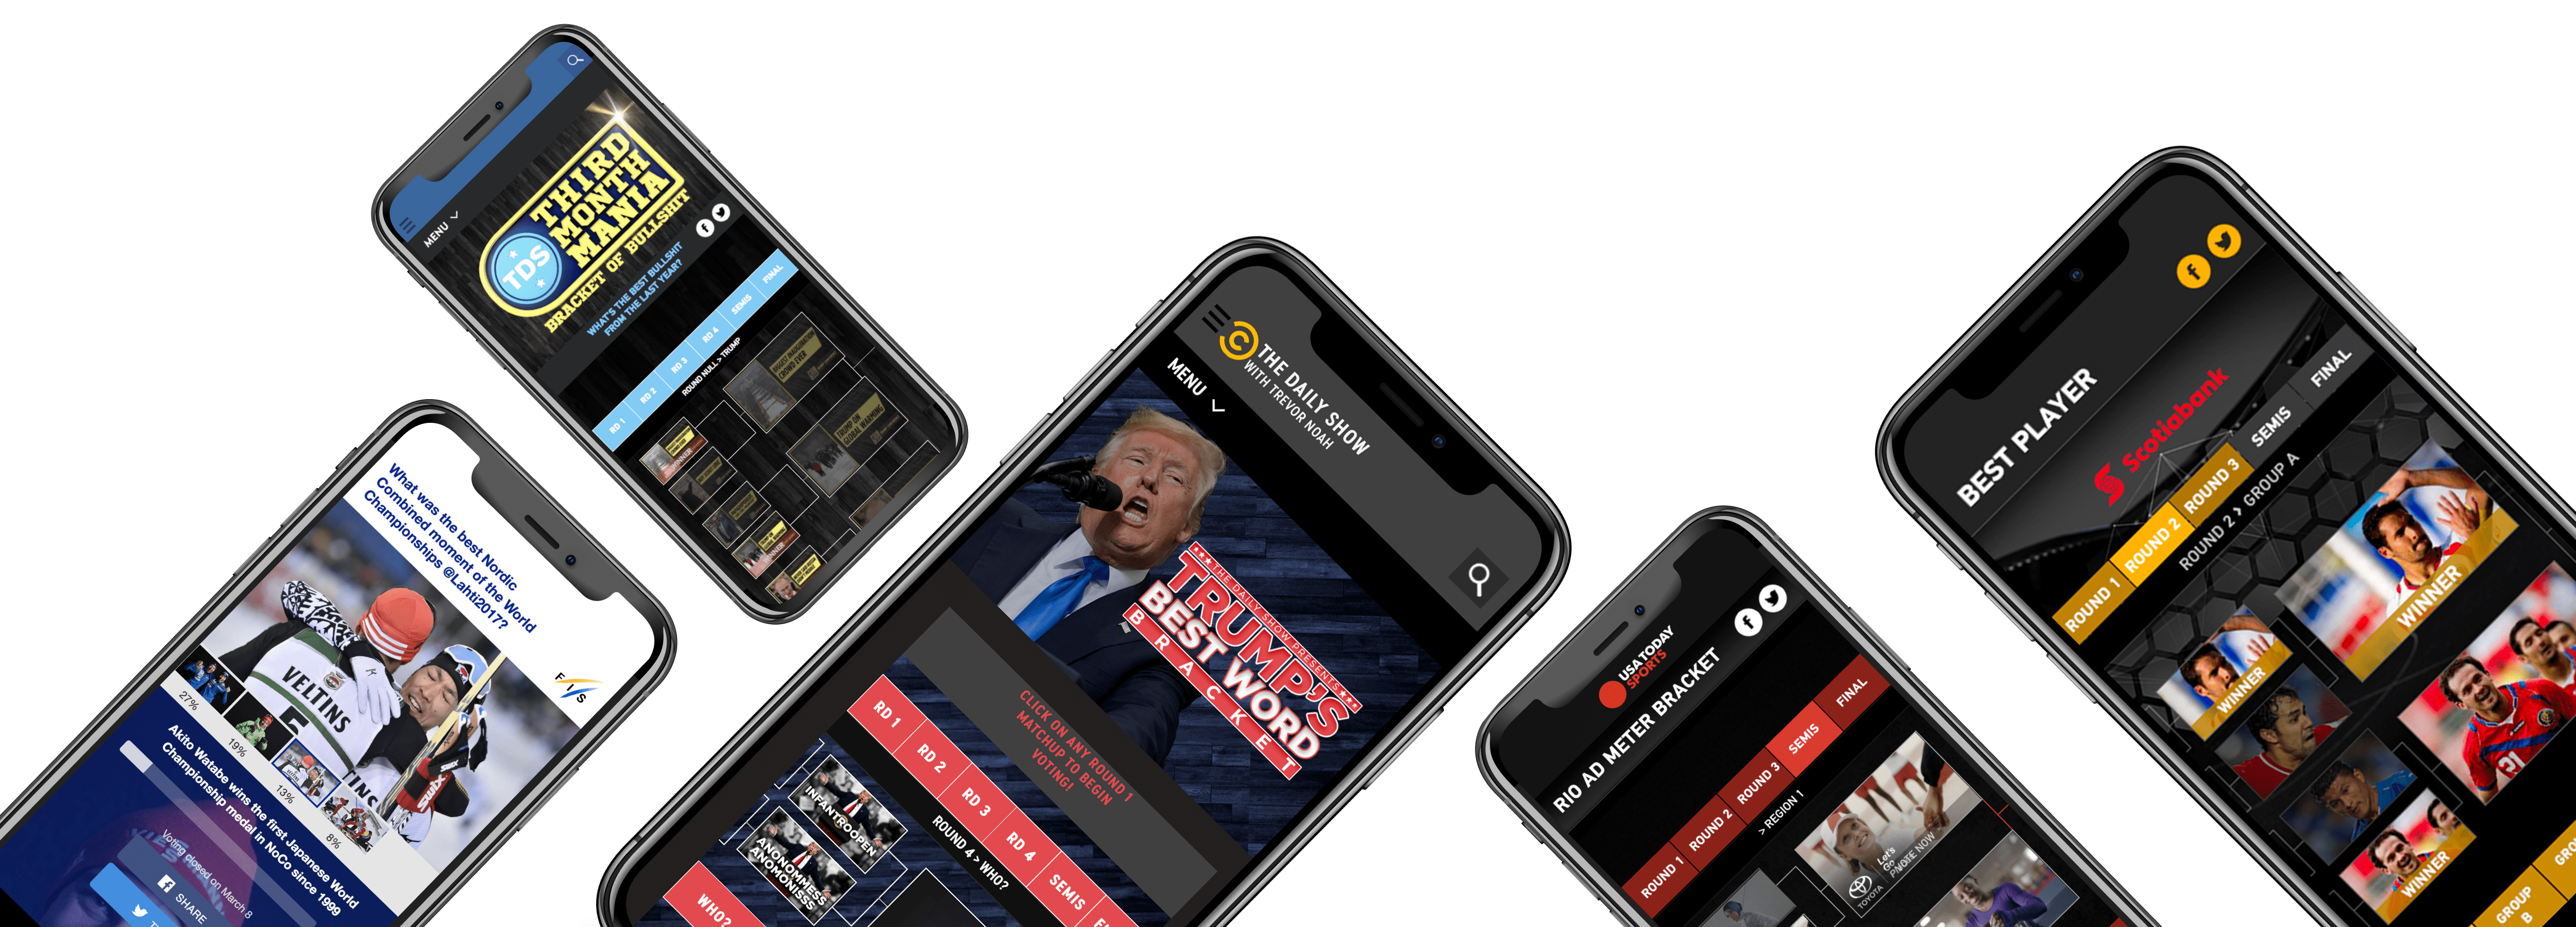 phones with examples of ix Vote, ix Poll and ix predict tools